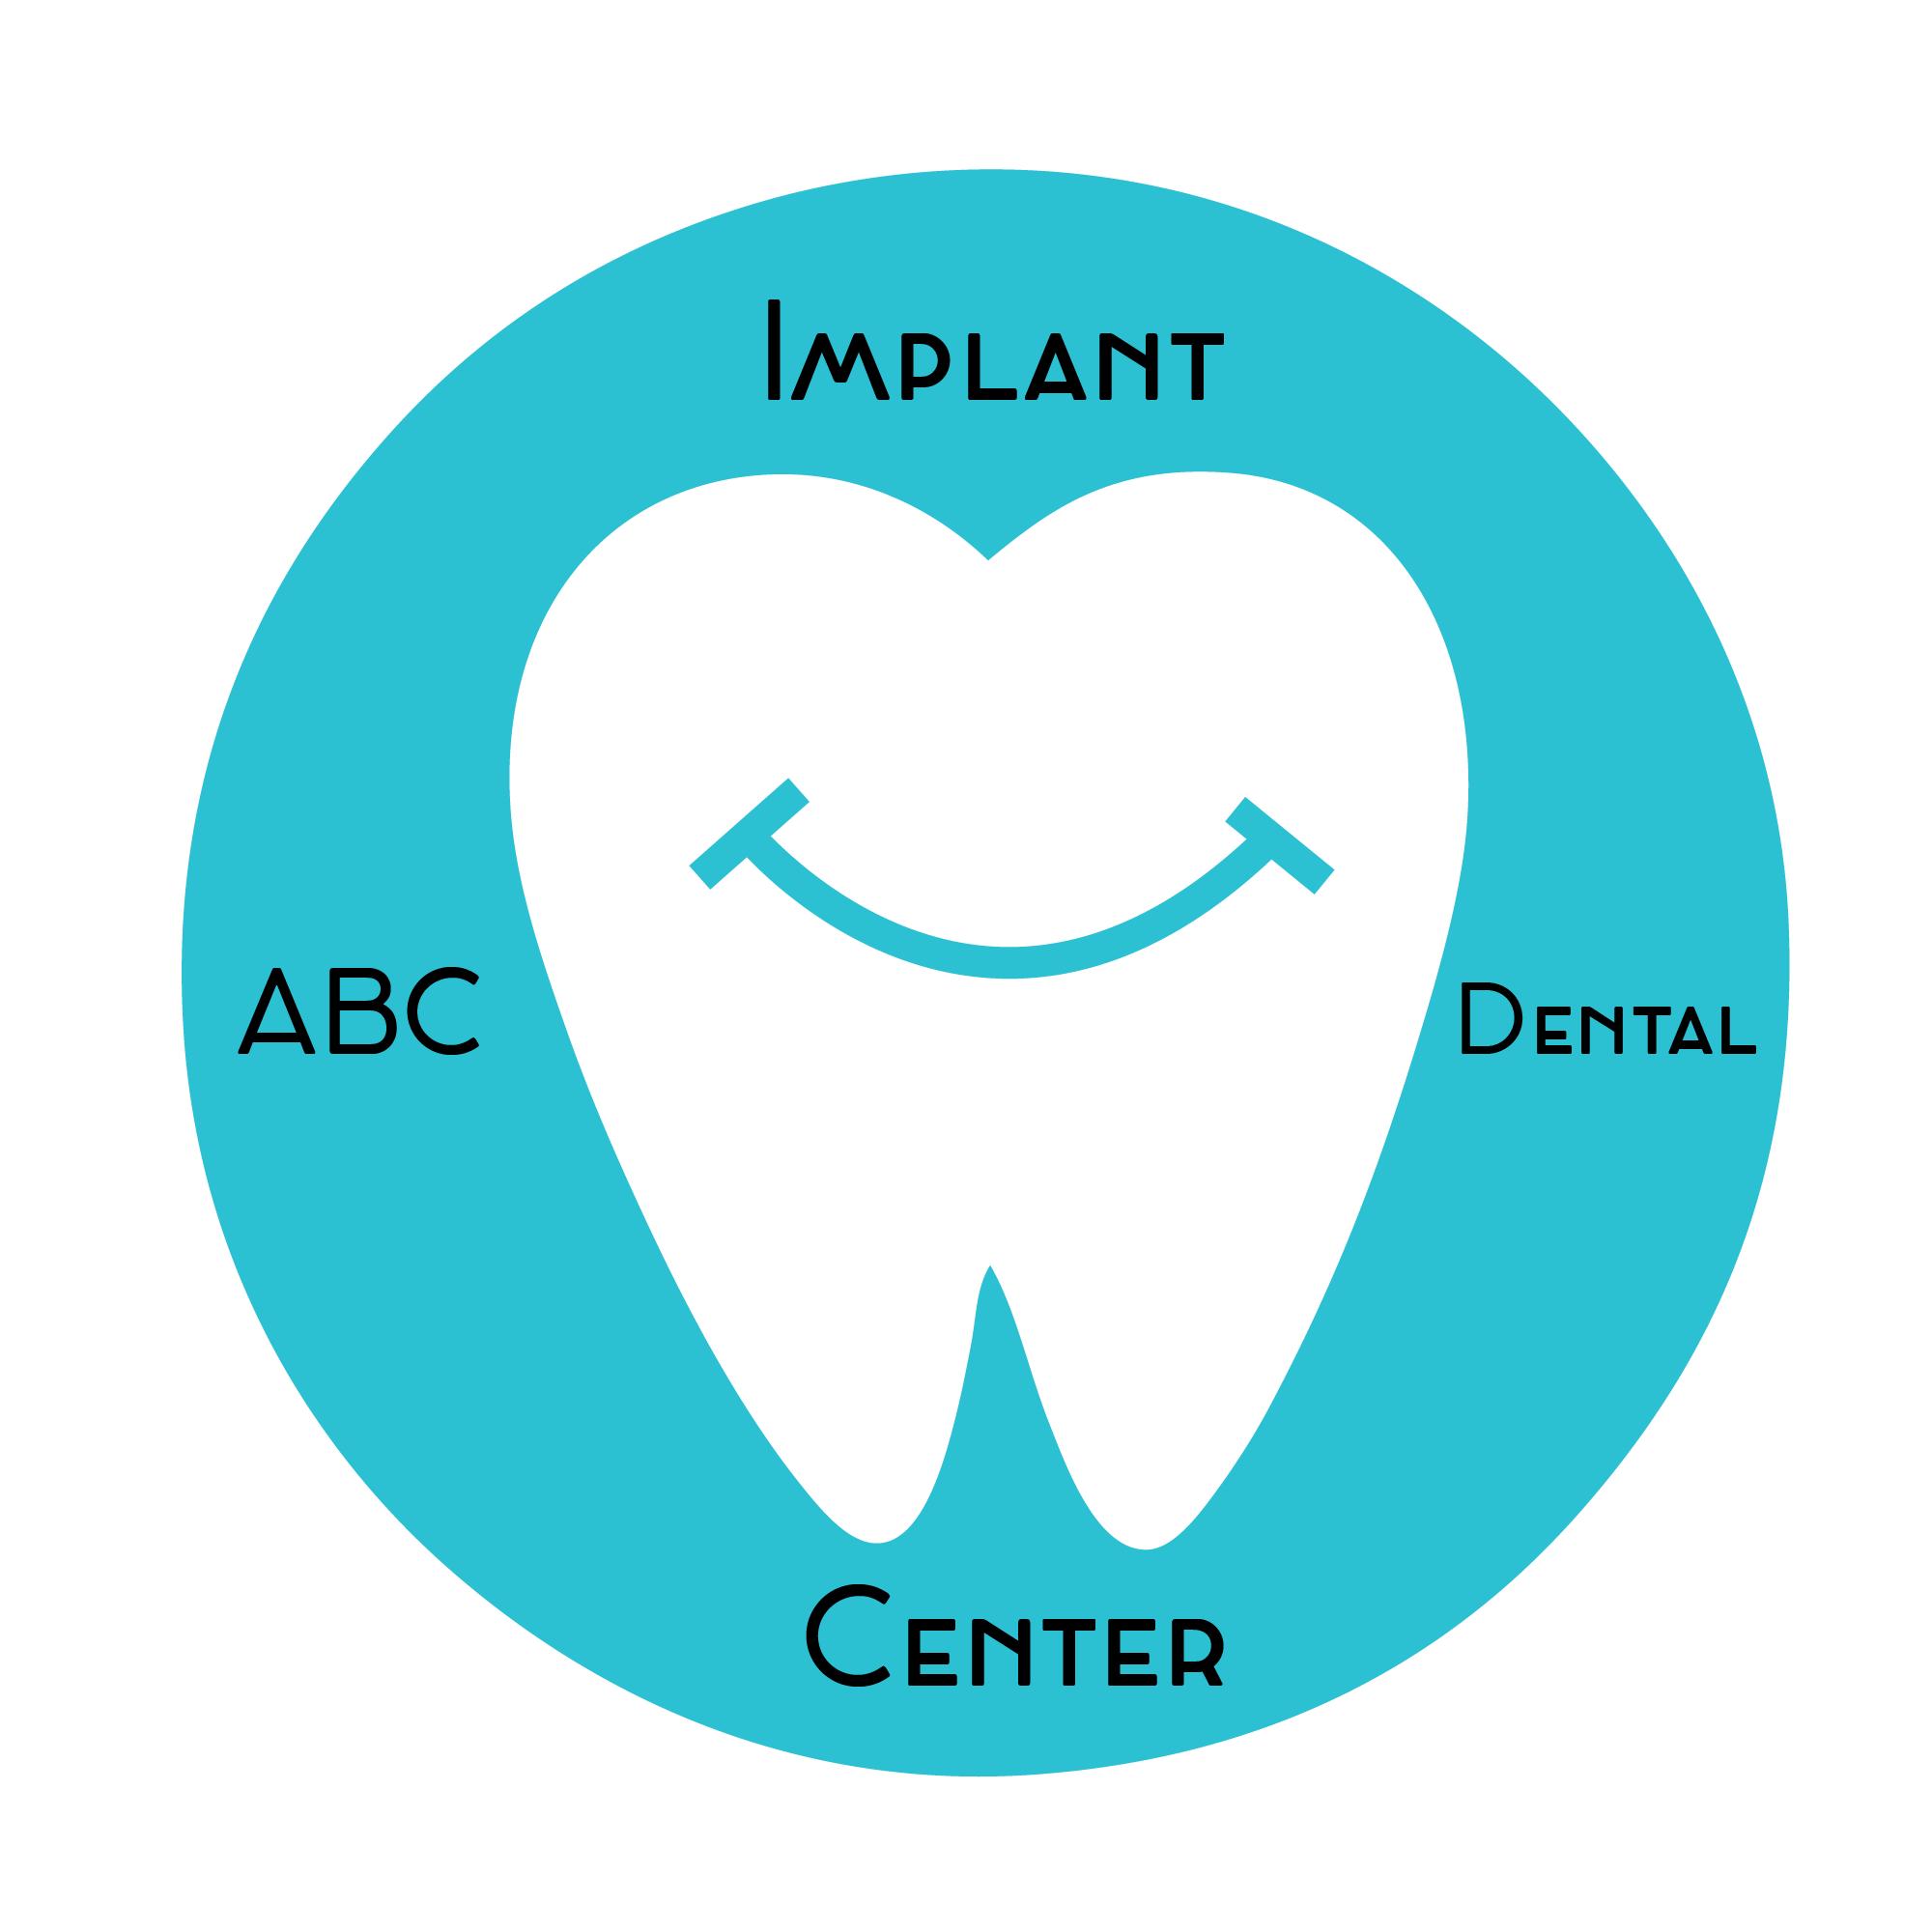 Best Implant Dentist Near Me: ABC Dental Implant Center, Las Vegas Nevada (NV